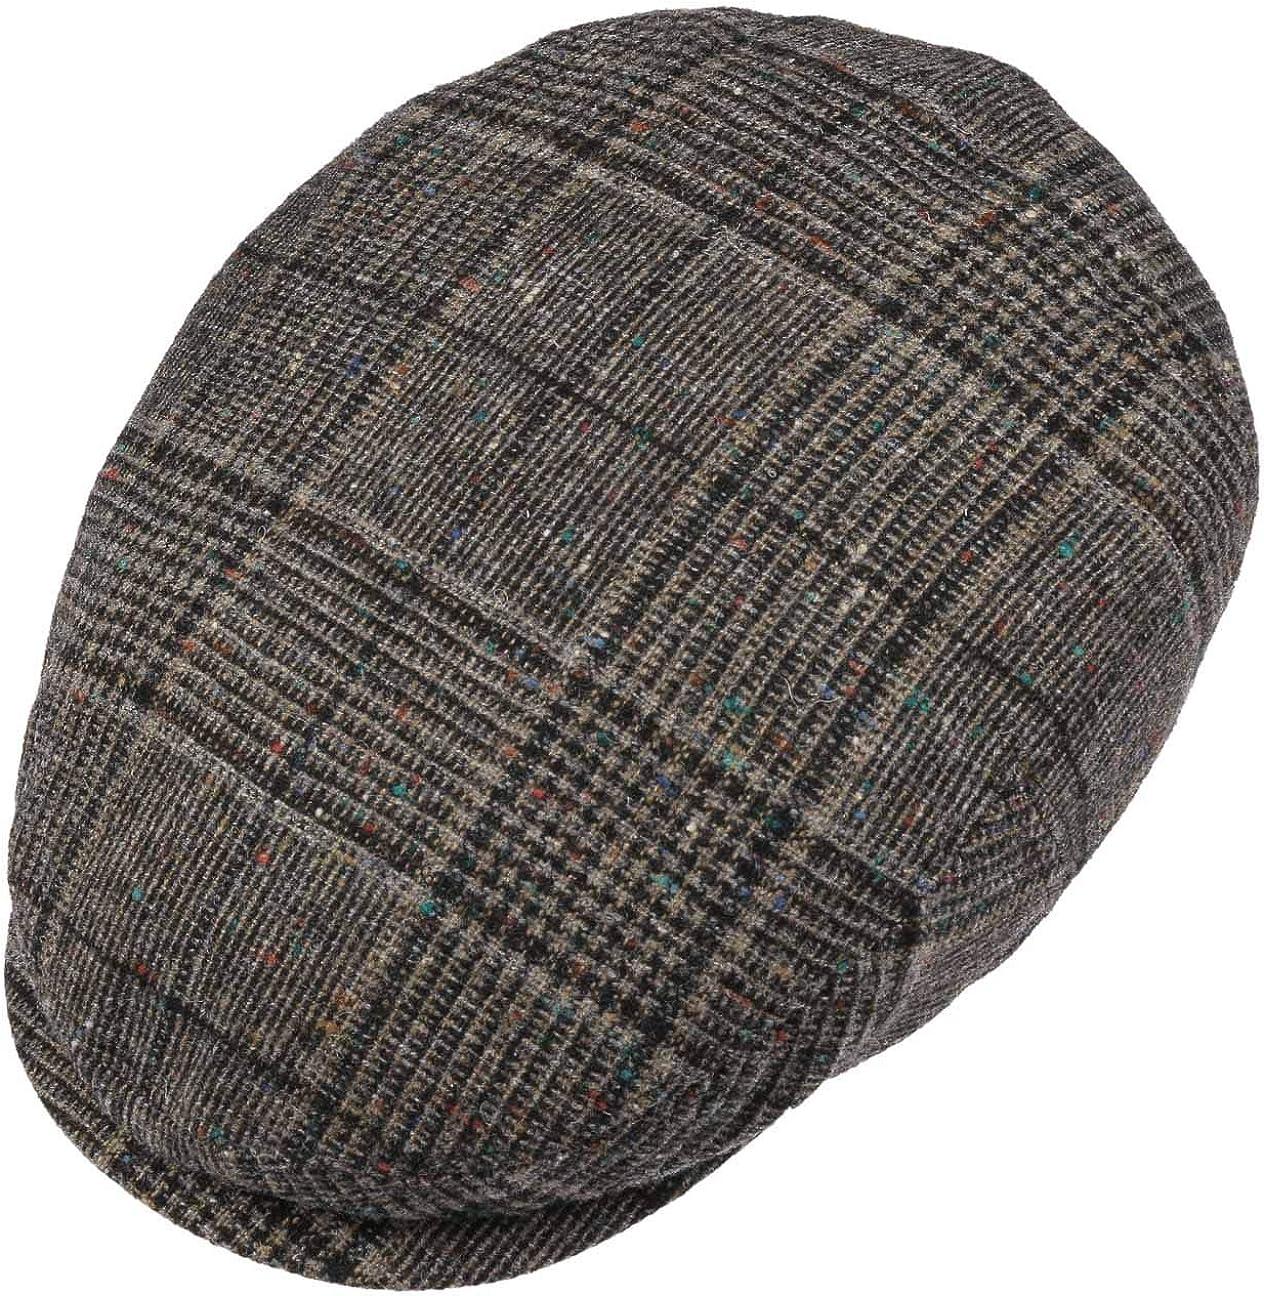 Futter Fr/ühling-Sommer Herbst-Winter Made in The EU mit Schirm Stetson Kent Wool Flatcap Schirmm/ütze Schieberm/ütze Wollcap Herren